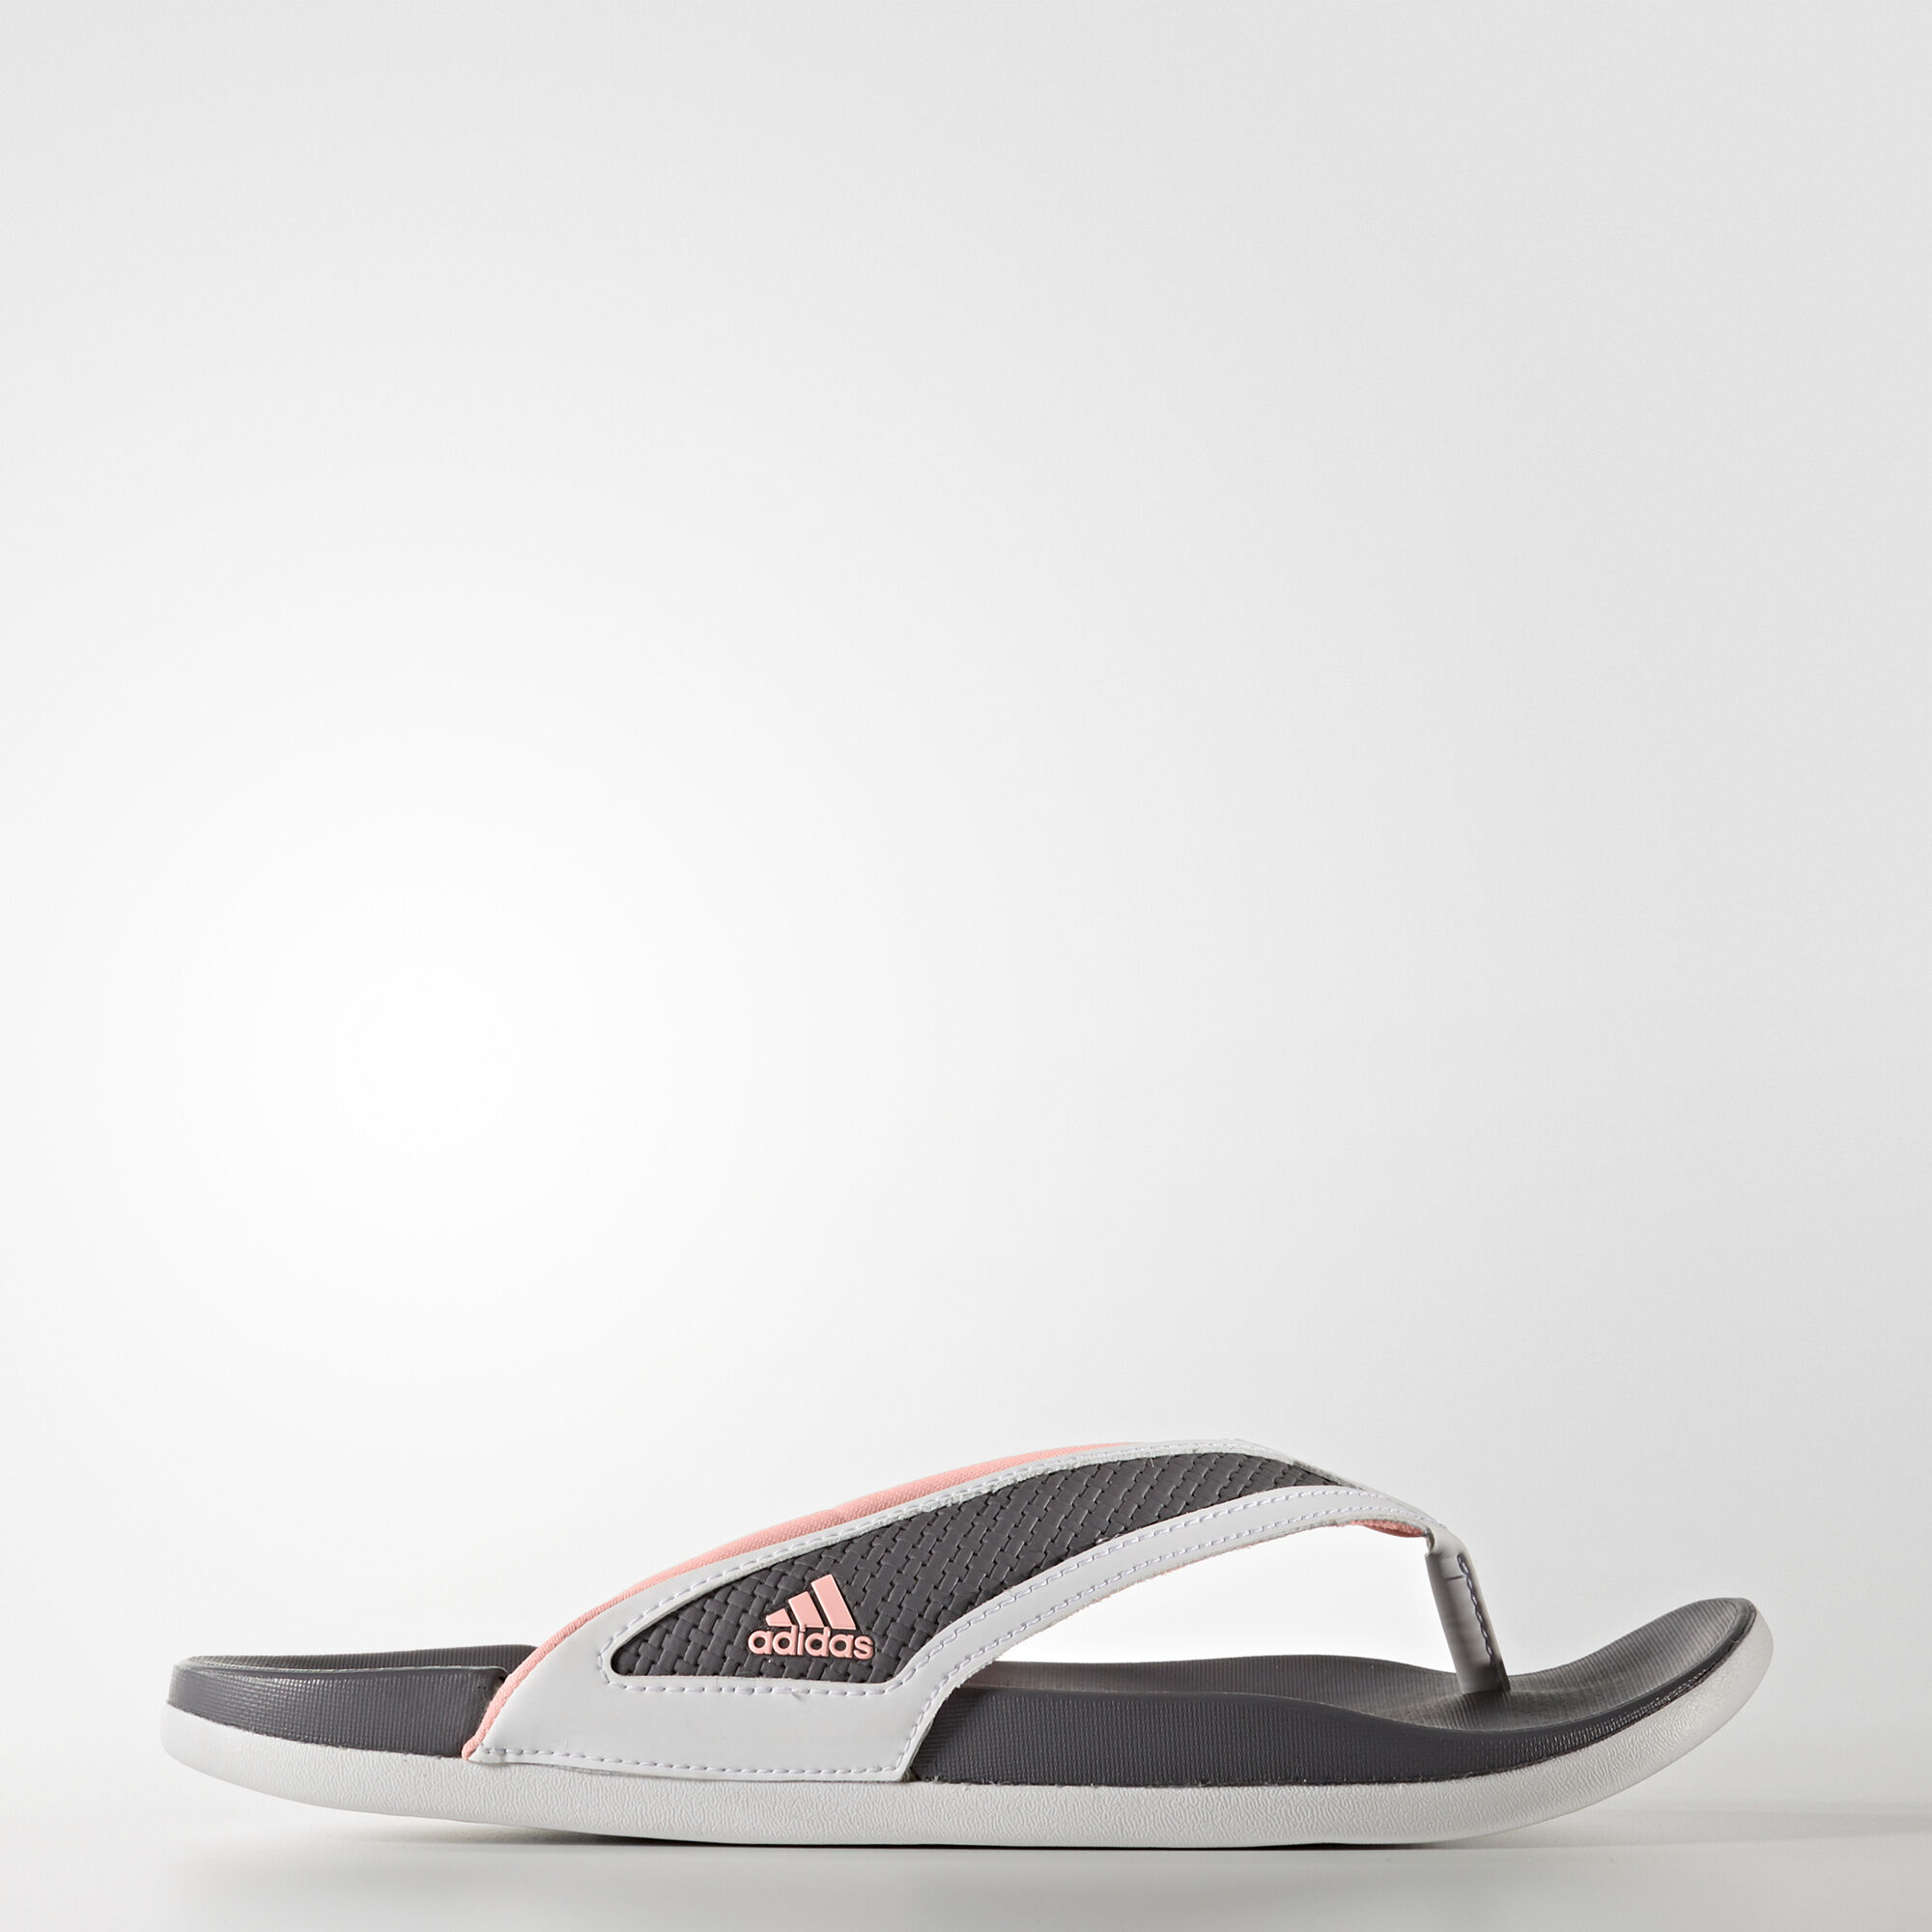 5b973c0160e8 Buy adidas flip flops canada   OFF66% Discounted